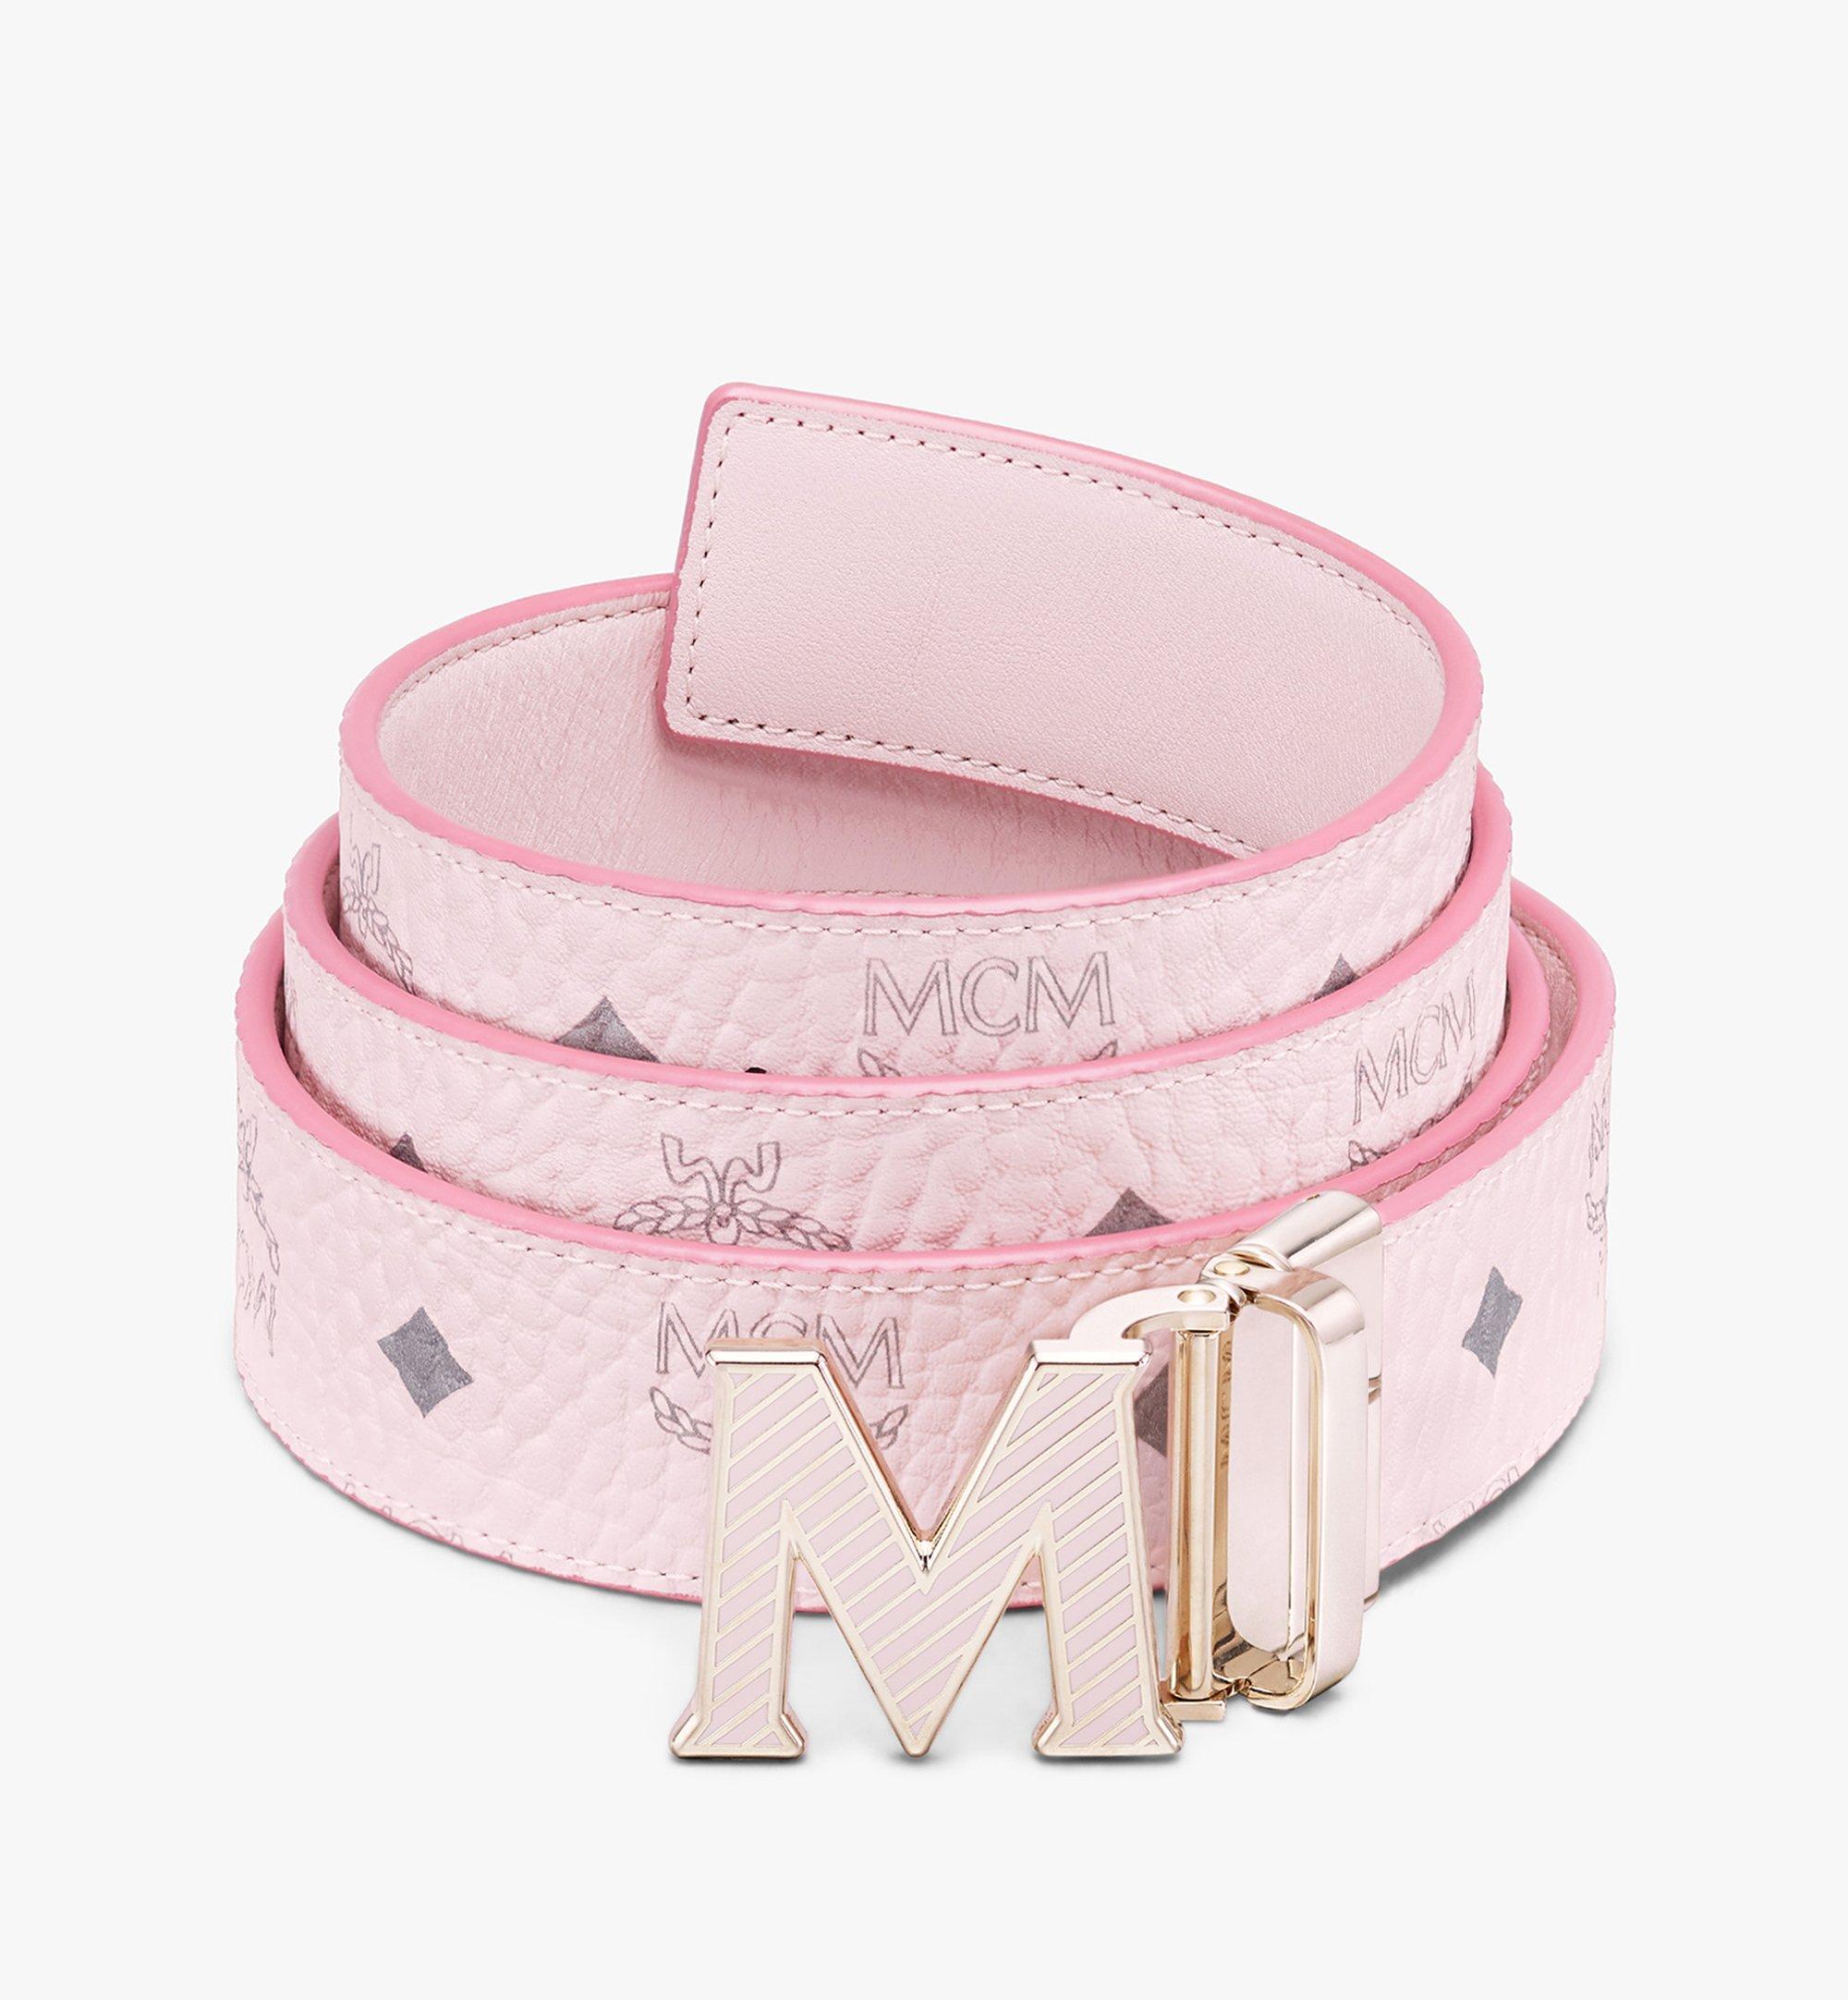 MCM Visetos皮革 Claus Oblique M 1.5 吋可翻轉使用皮帶 Pink MXBASVI20QH001 更多視圖 1